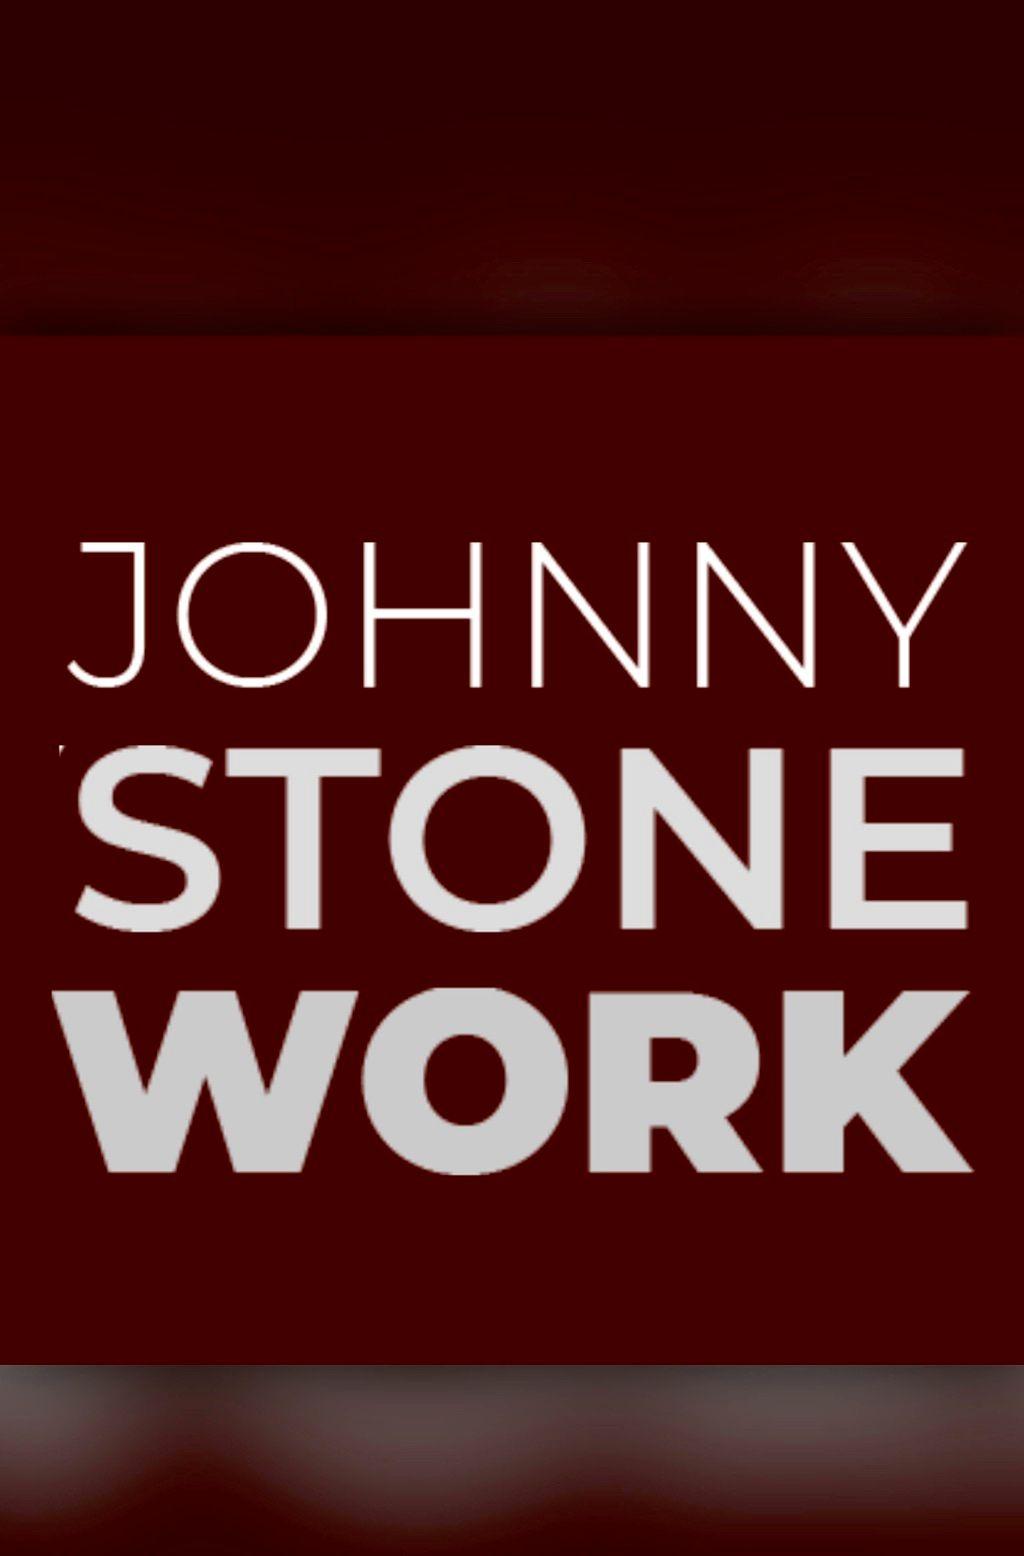 Johnnystonework Inc